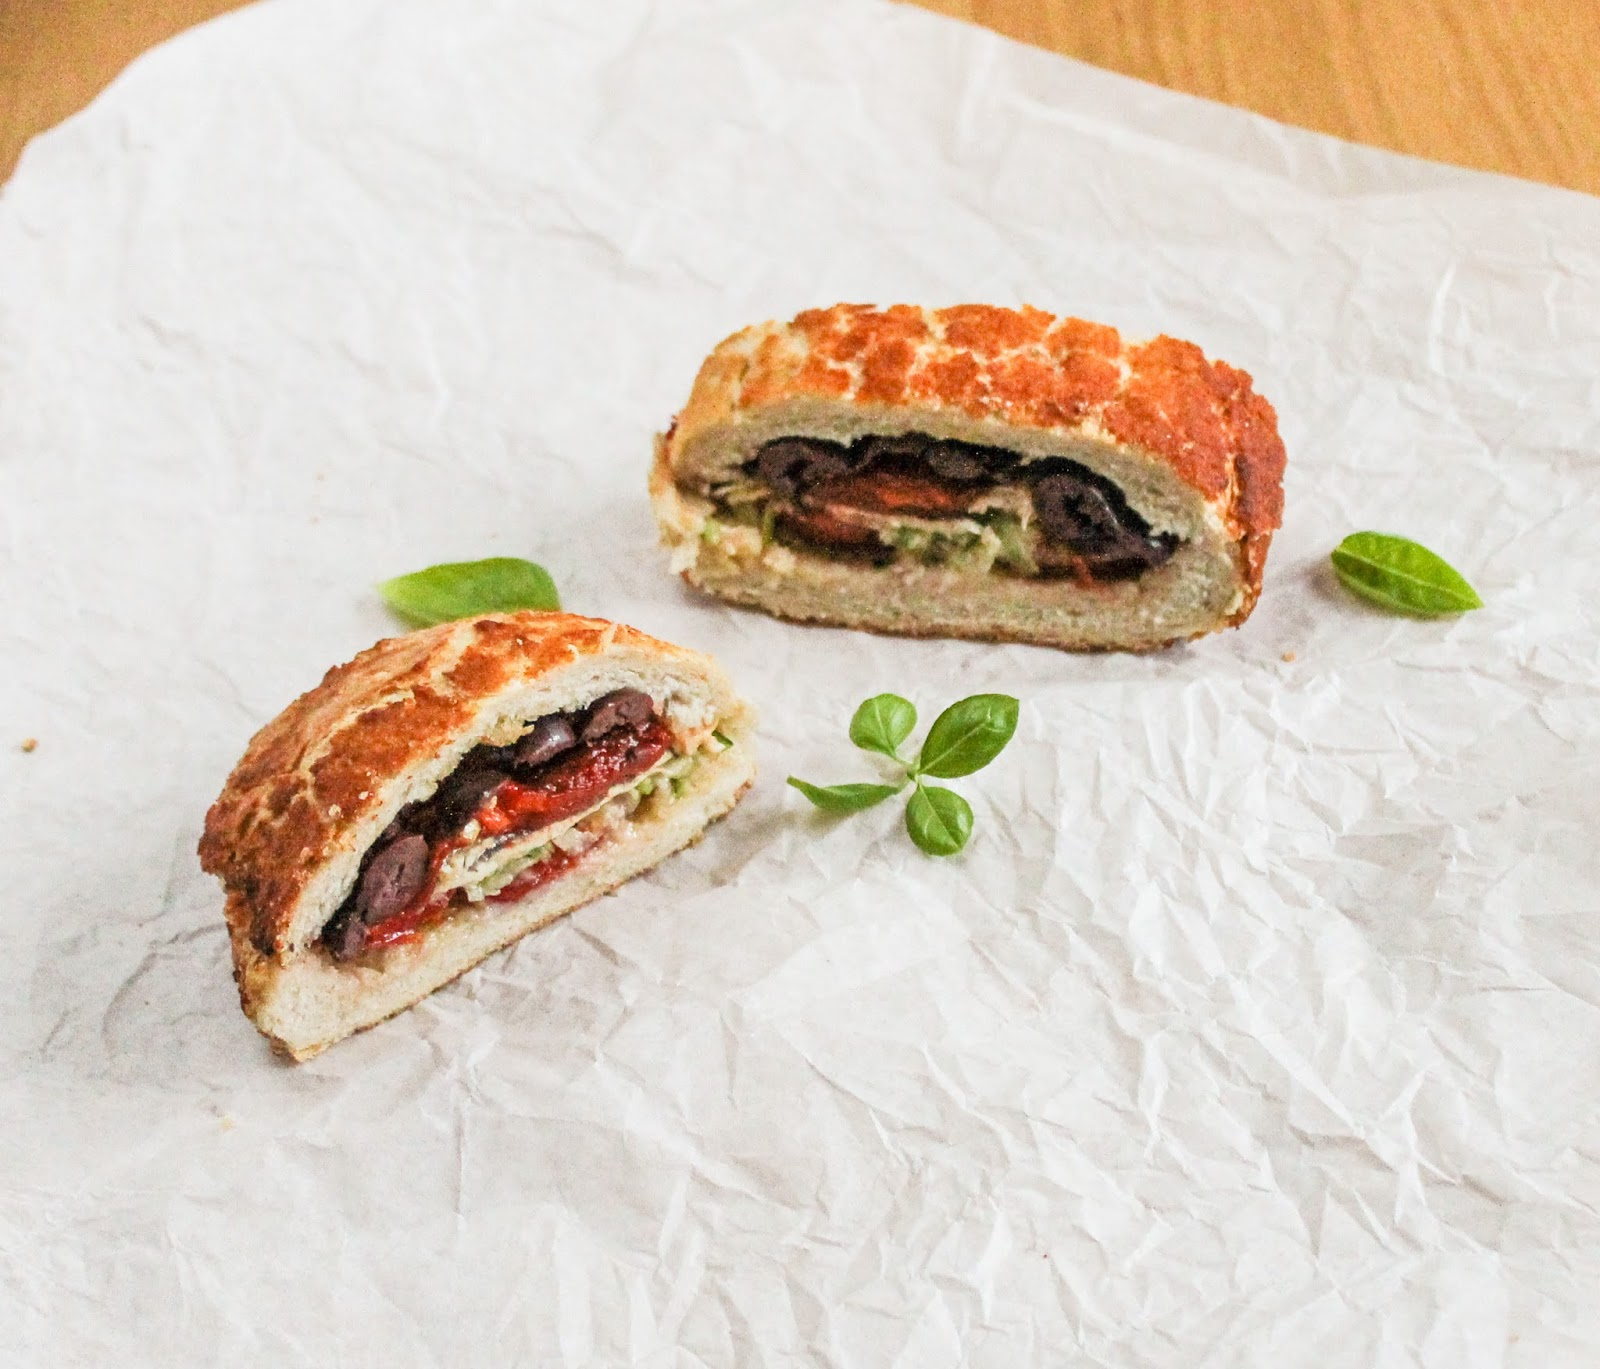 Provençal Pork Sandwich